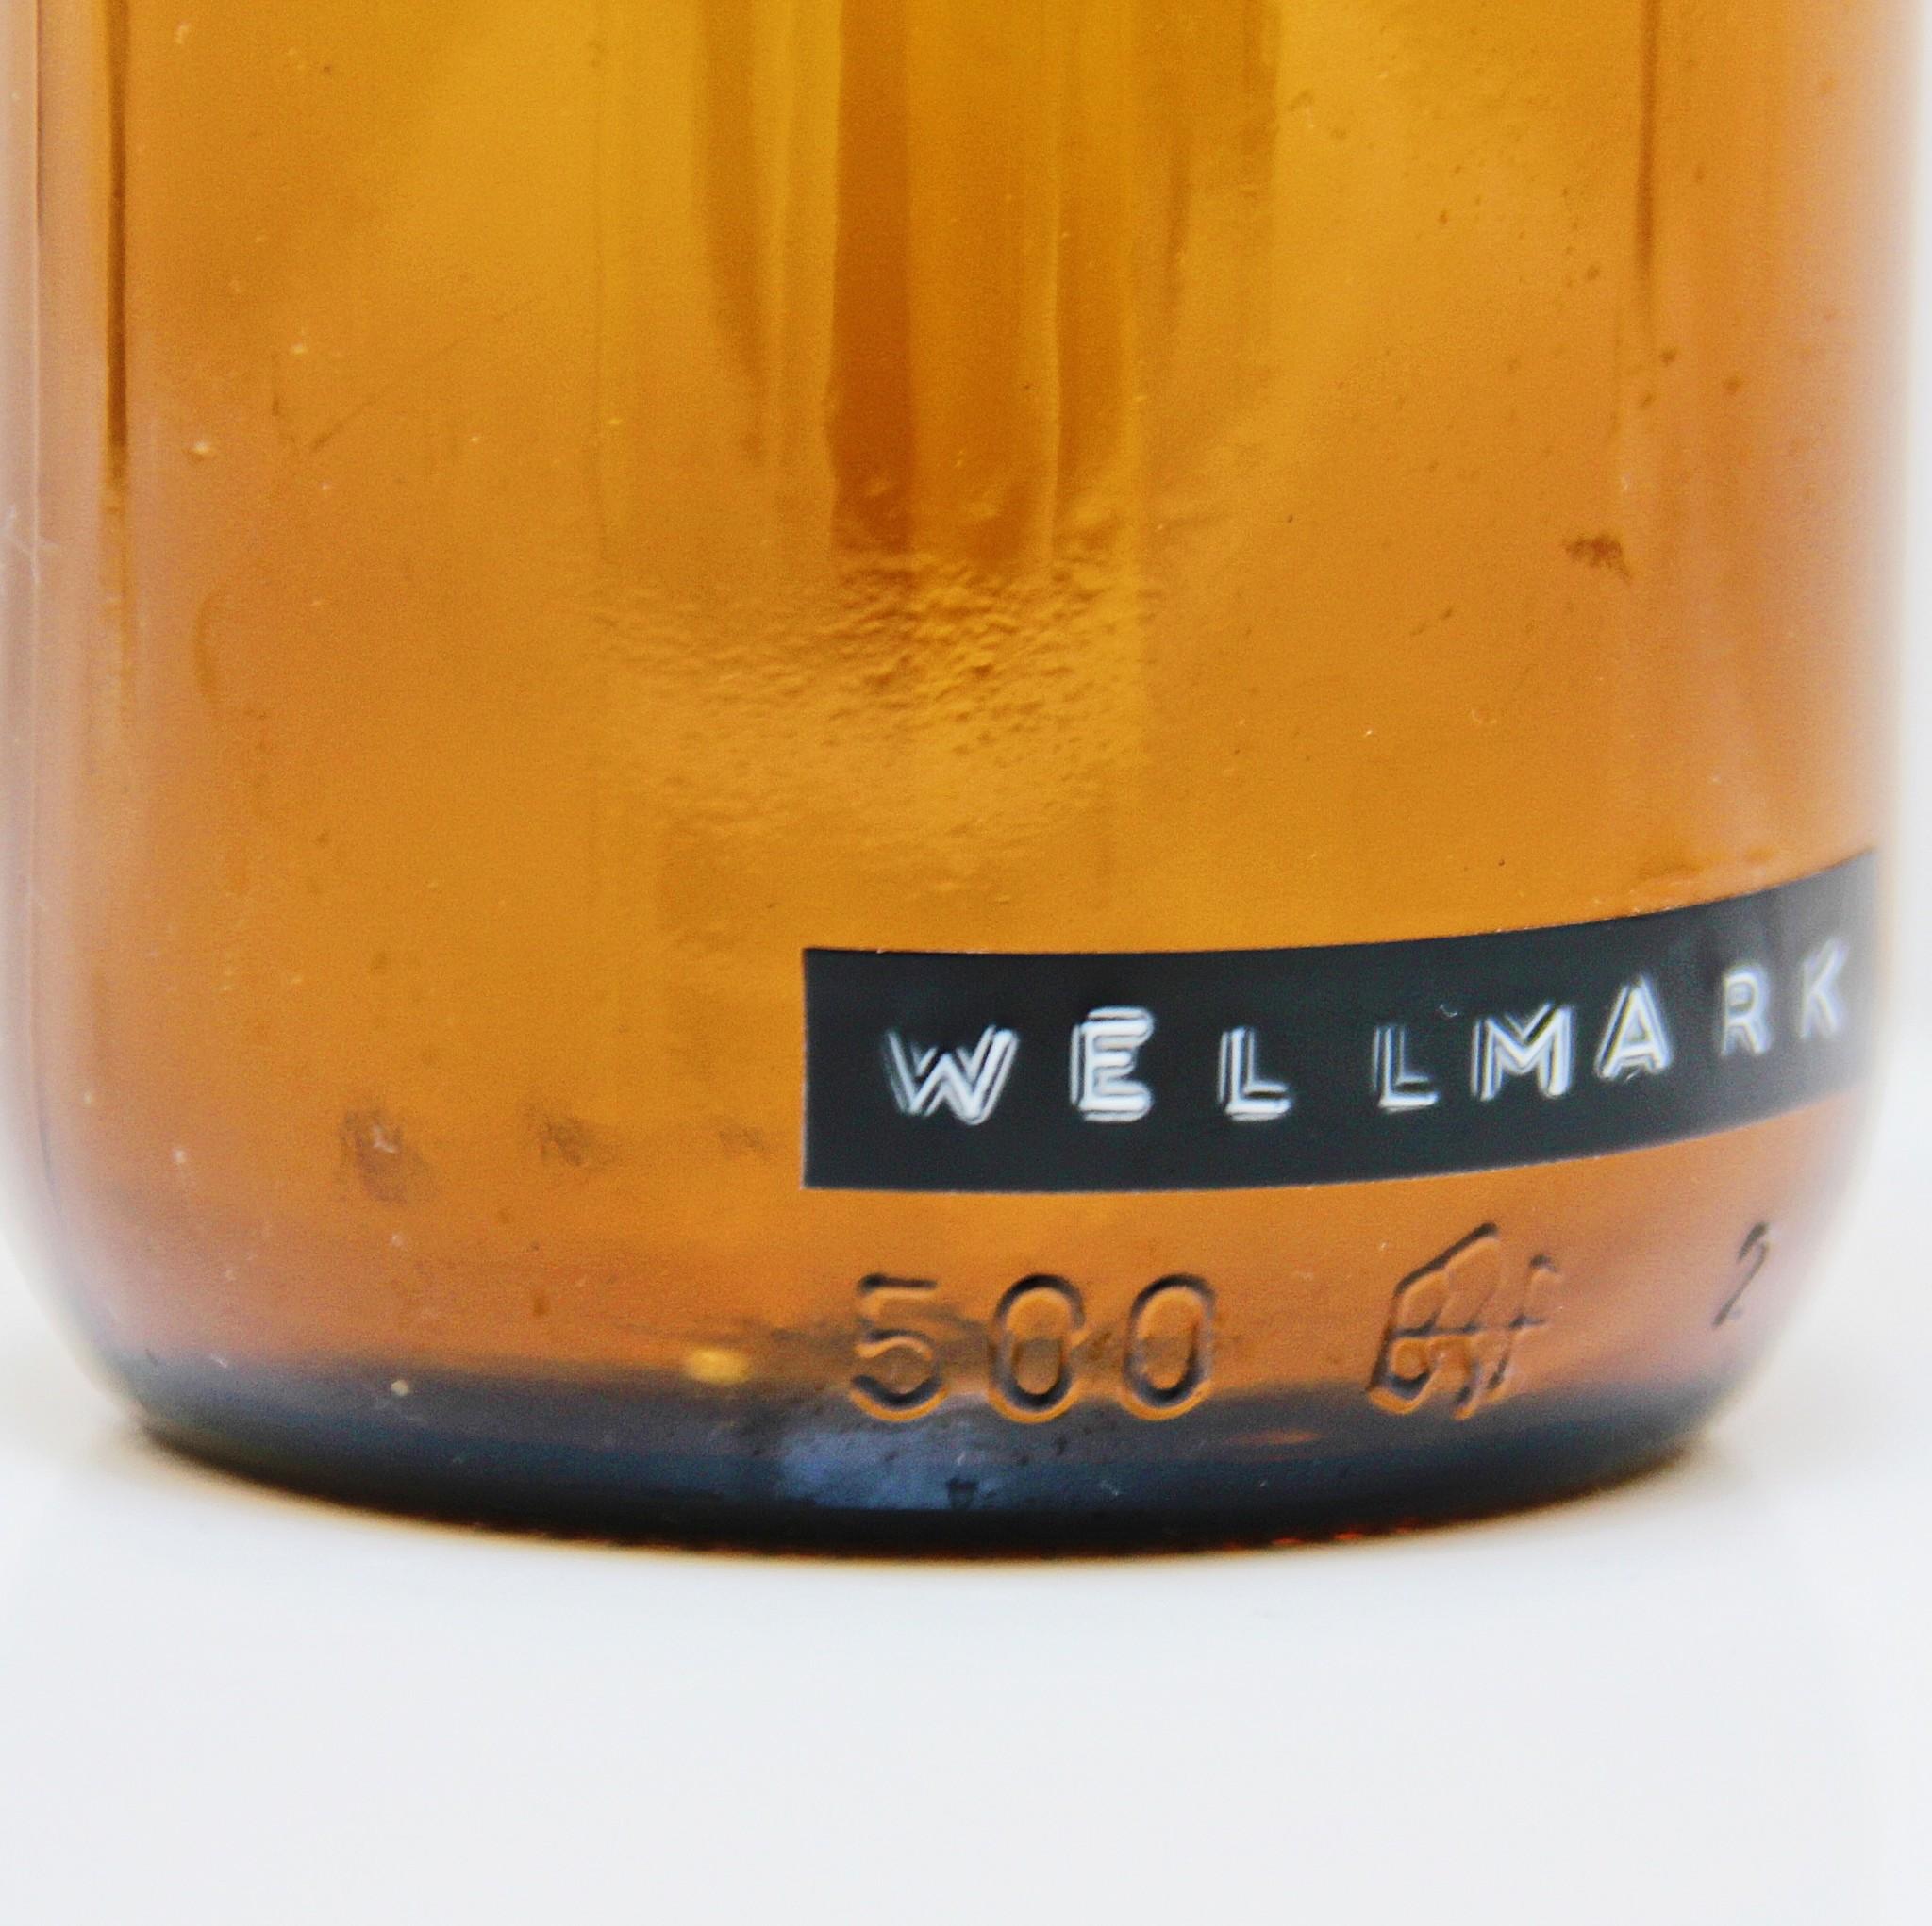 Wellmark Handlotion - messing - 250 ml